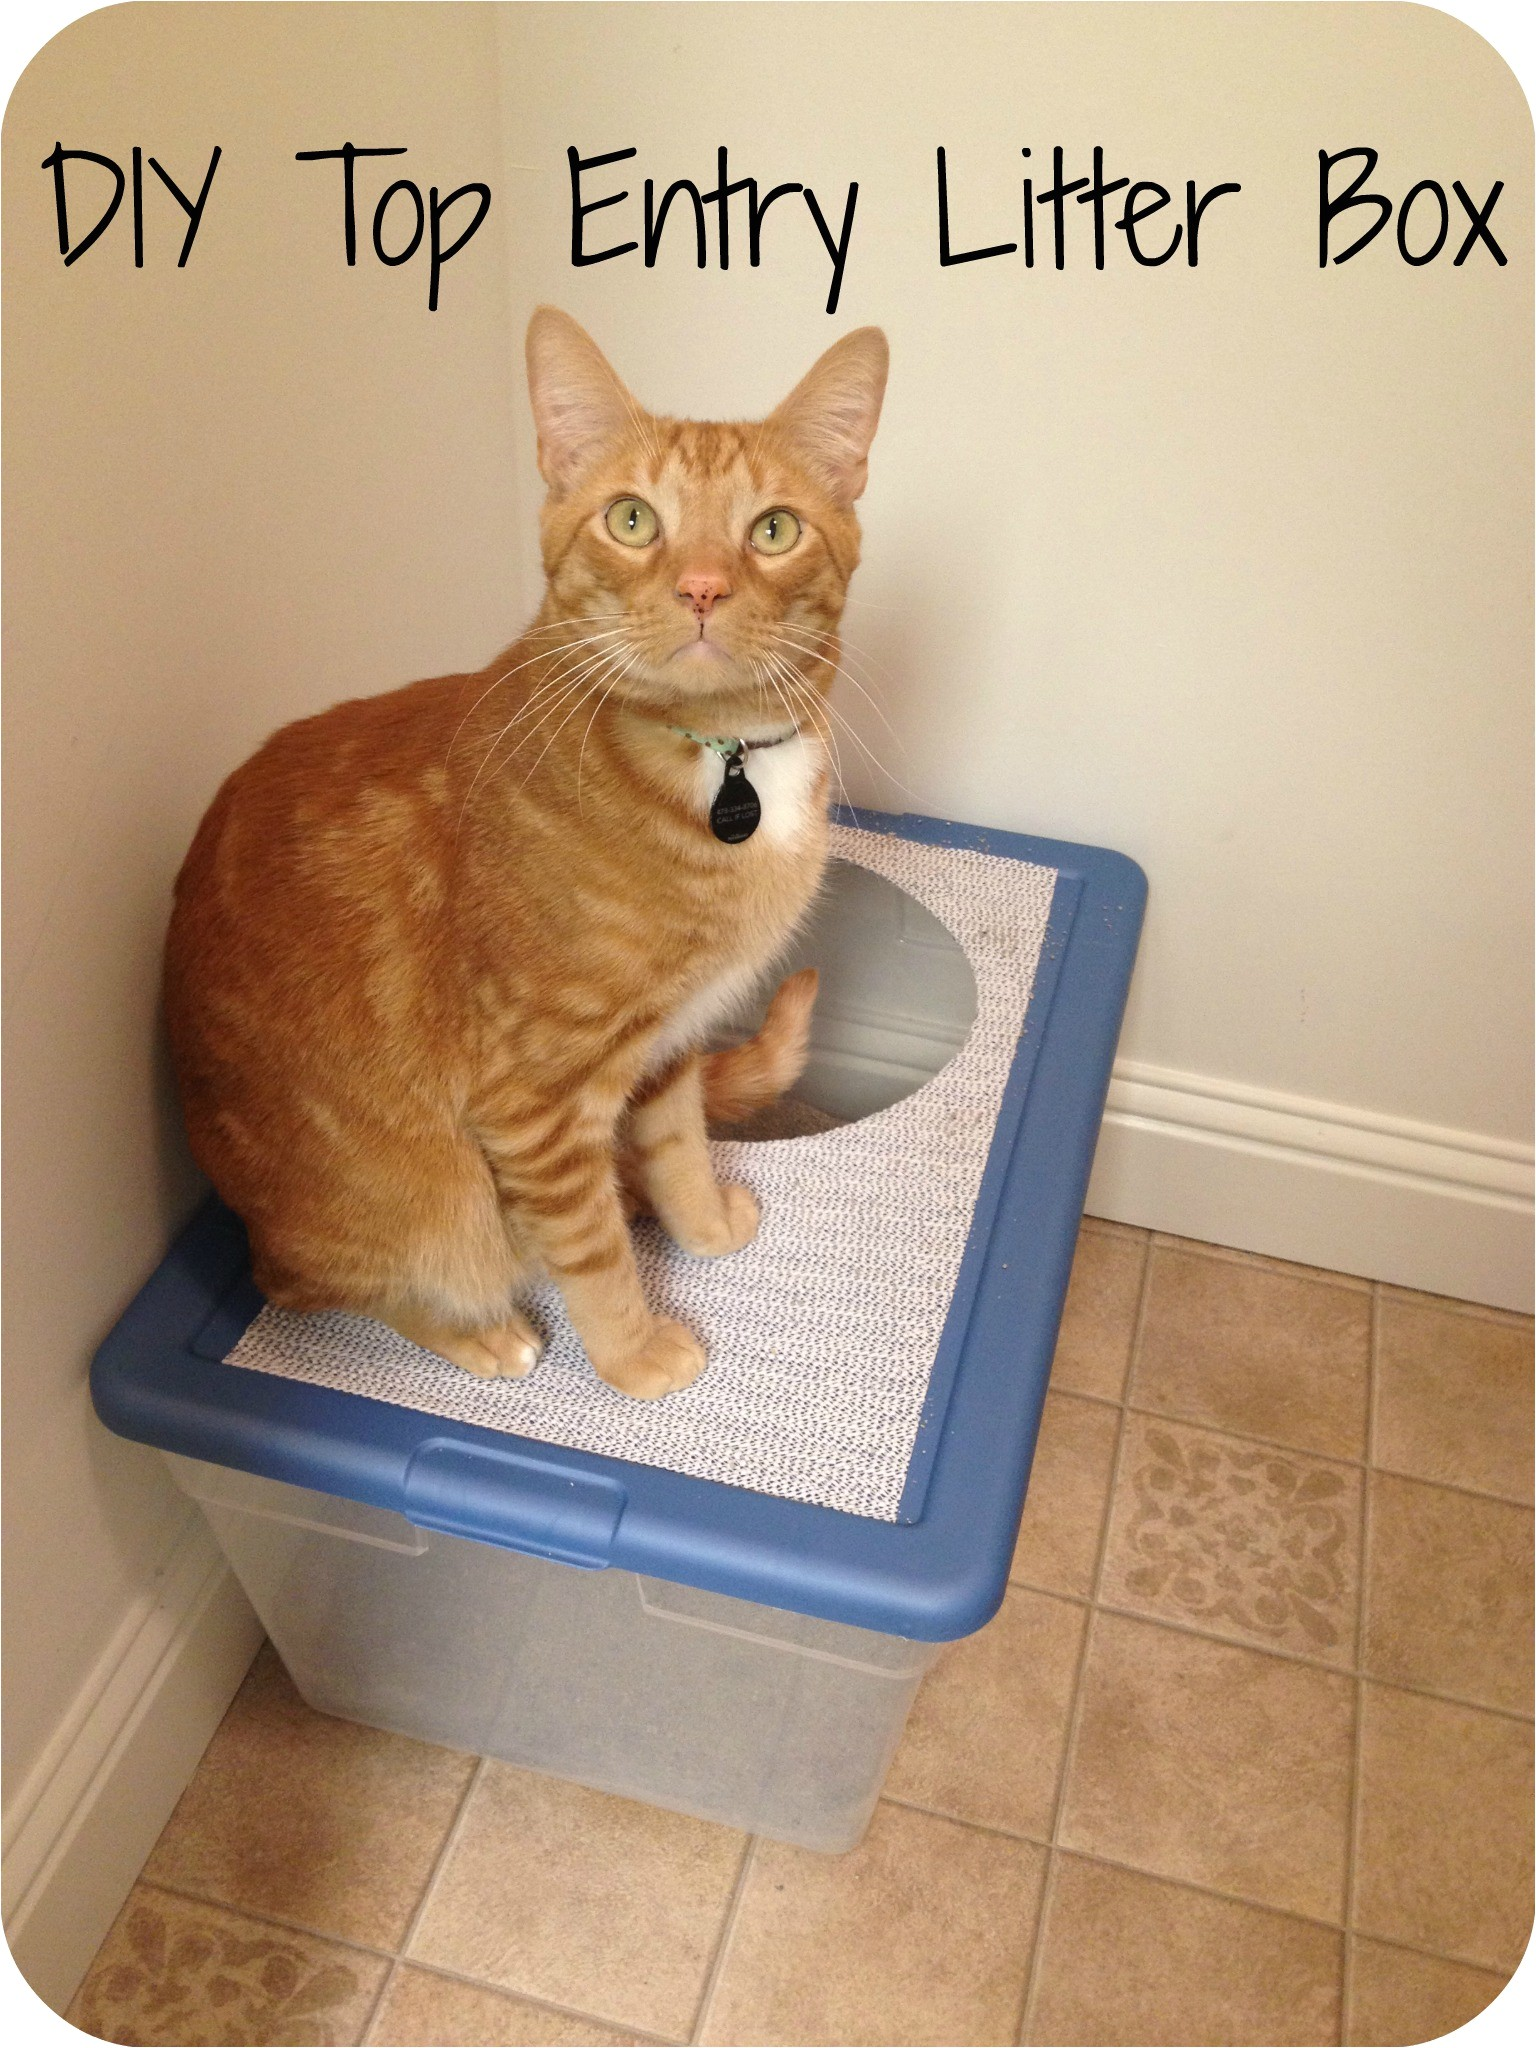 Diy top Entry Litter Box Diy top Entry Litter Box Makeover Meow